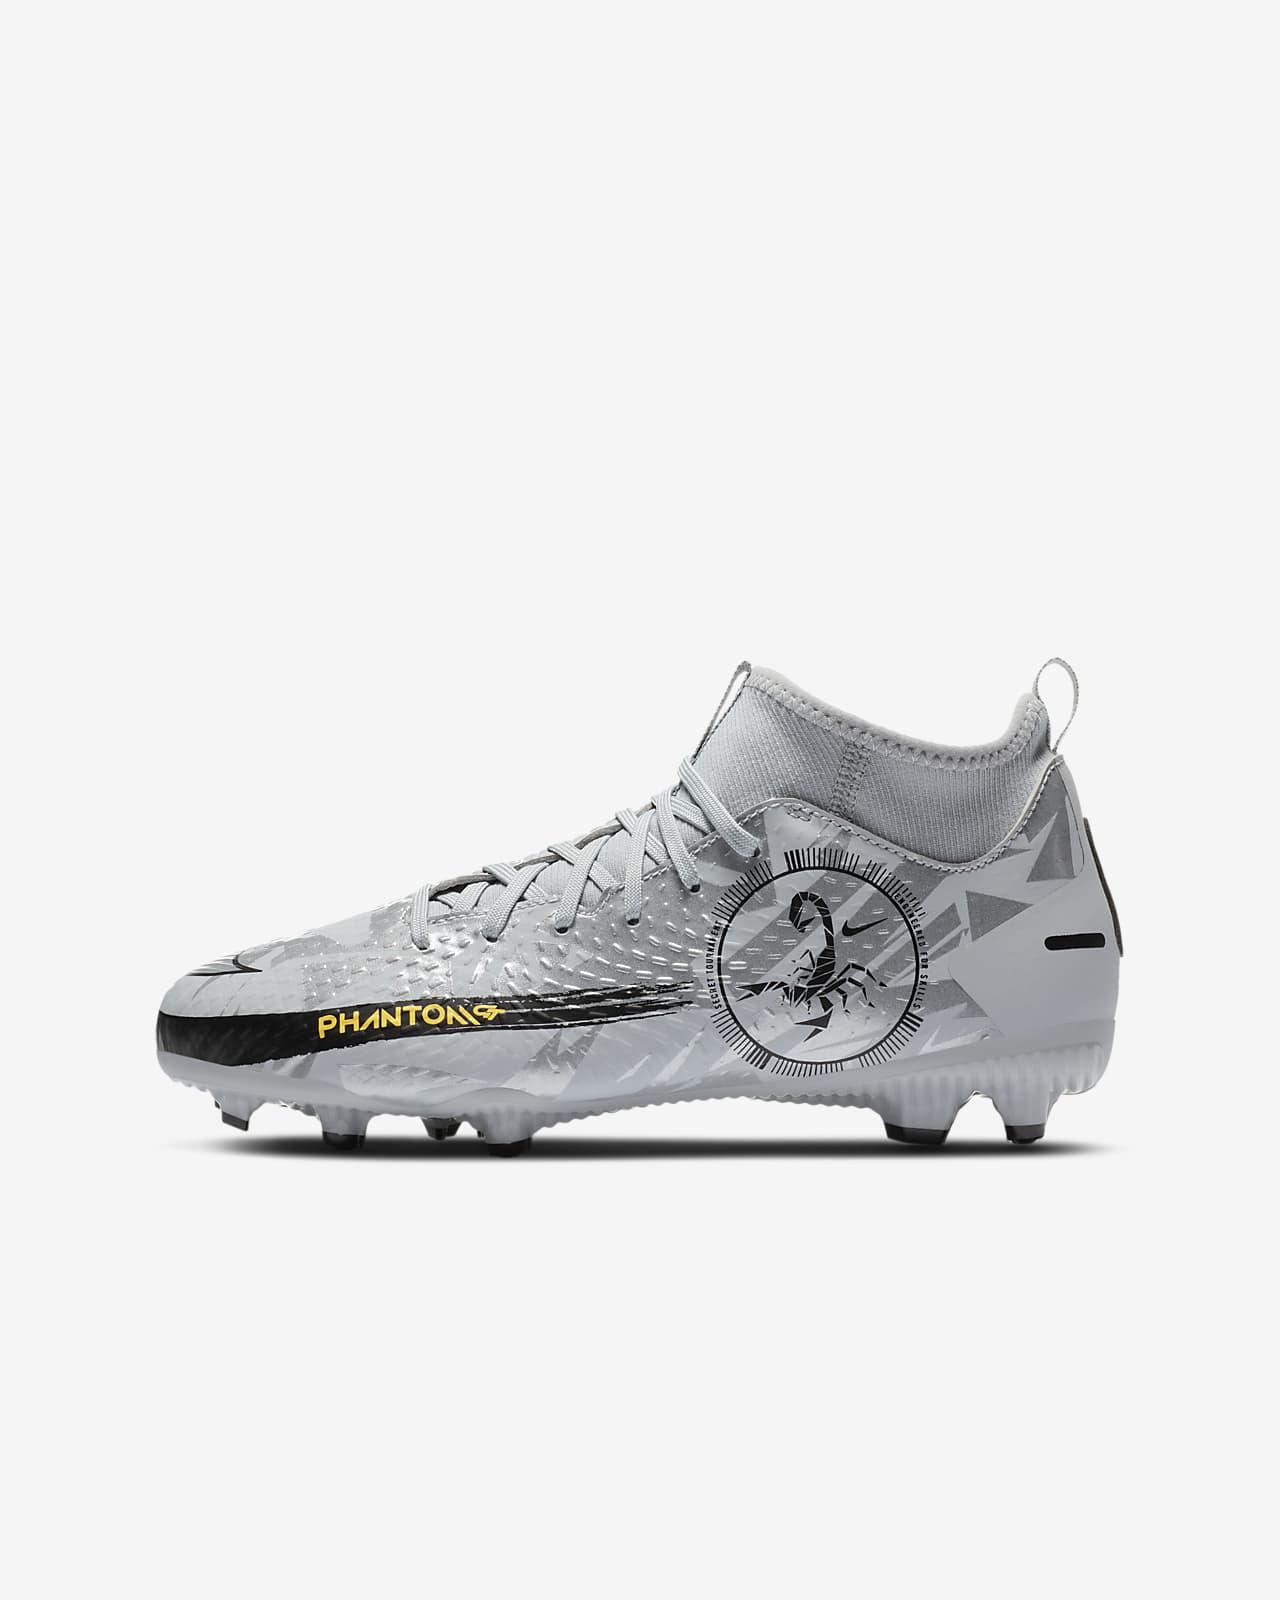 Nike Jr. Phantom Scorpion Academy Dynamic Fit MG Older/Younger Kids' Multi-Ground Football Boot